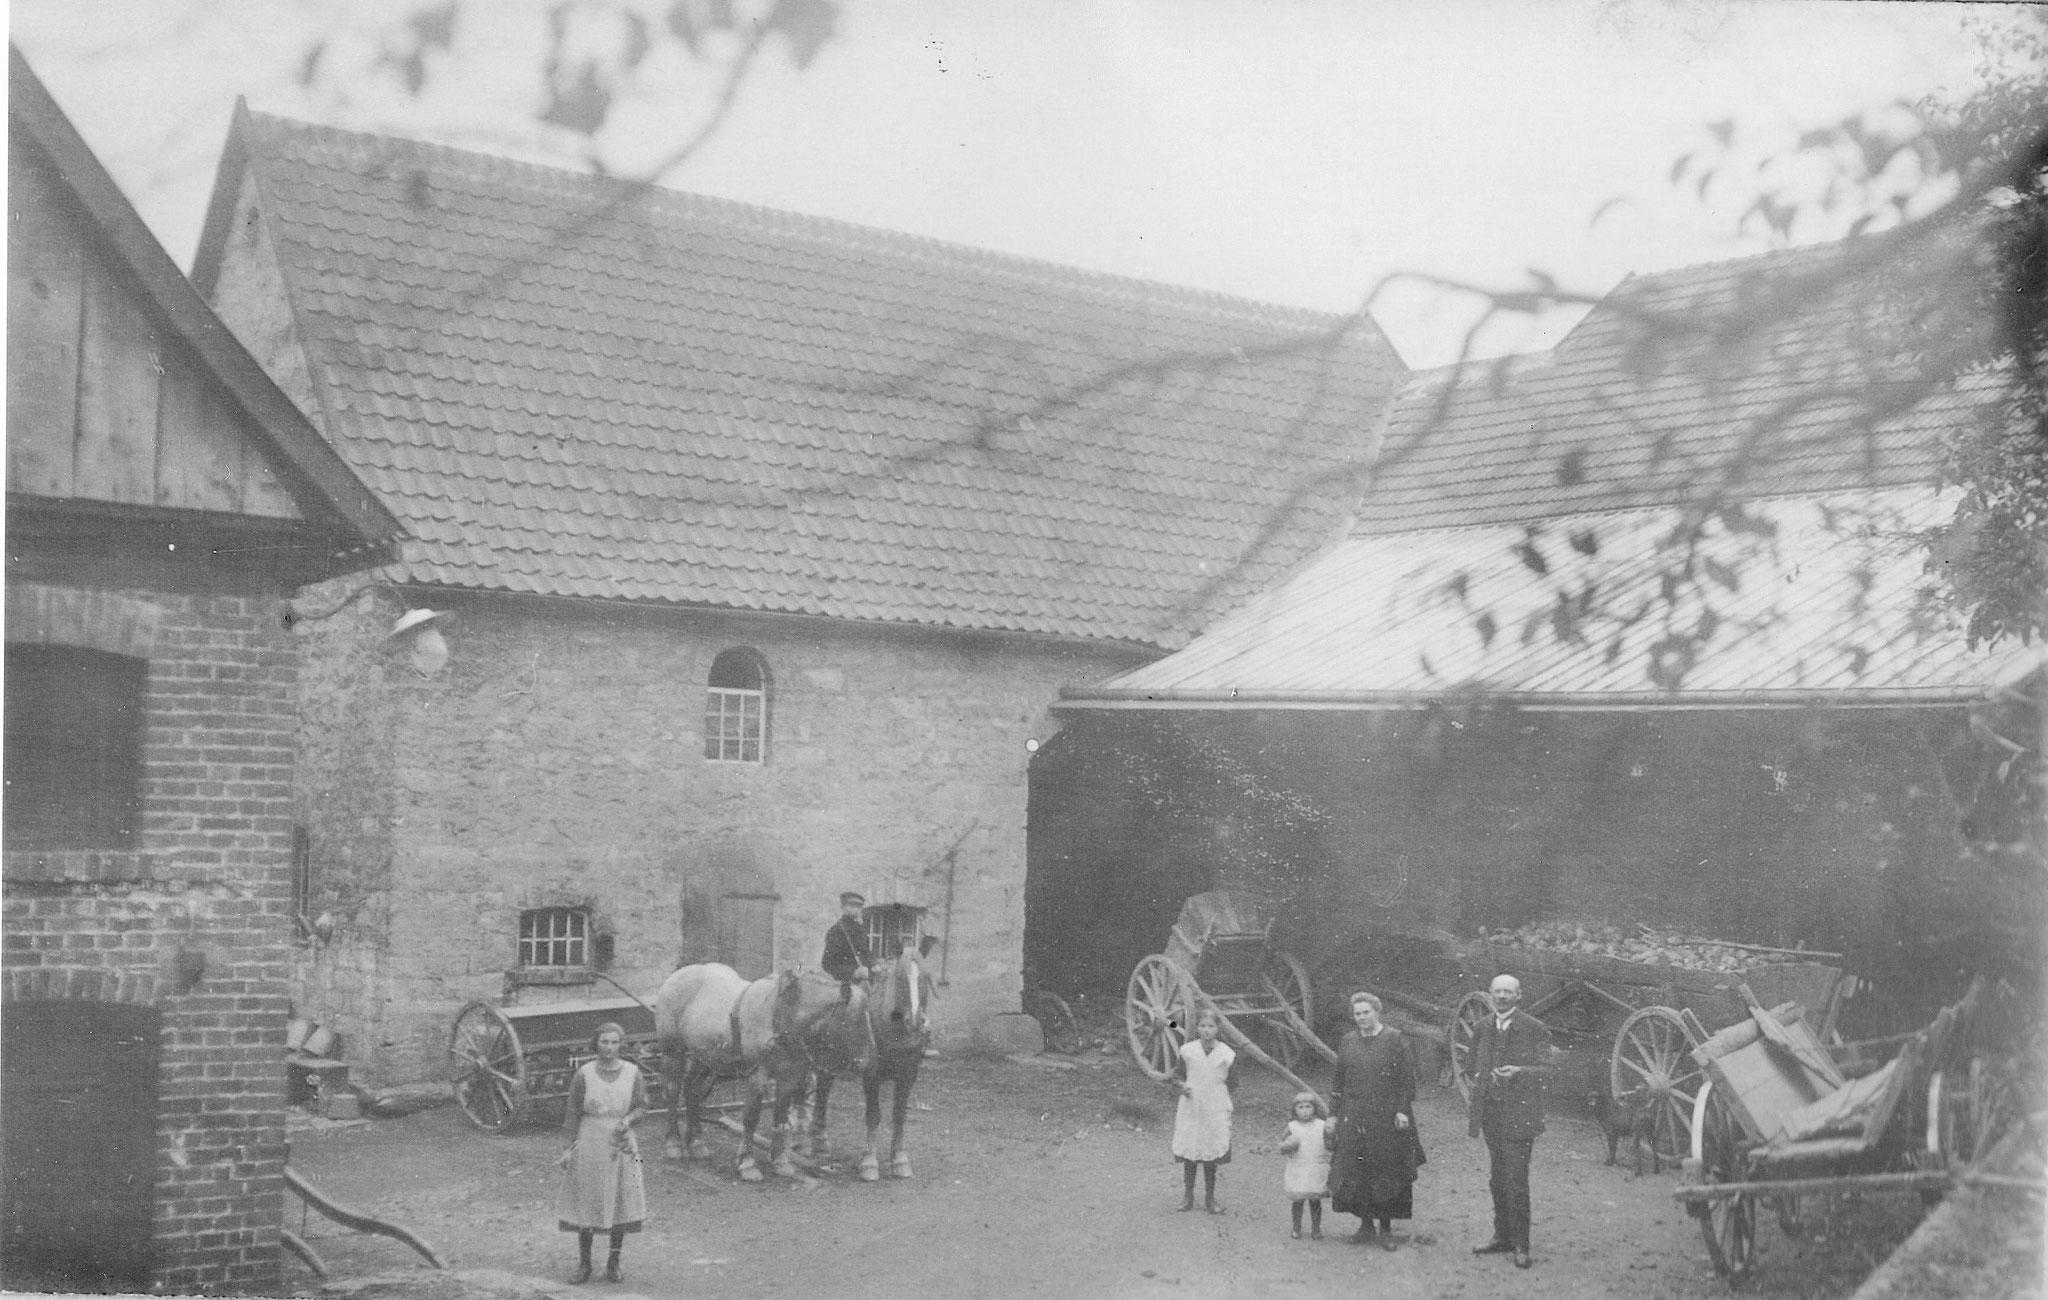 Der Hof Hövelmann in Oberbergheim um 1920